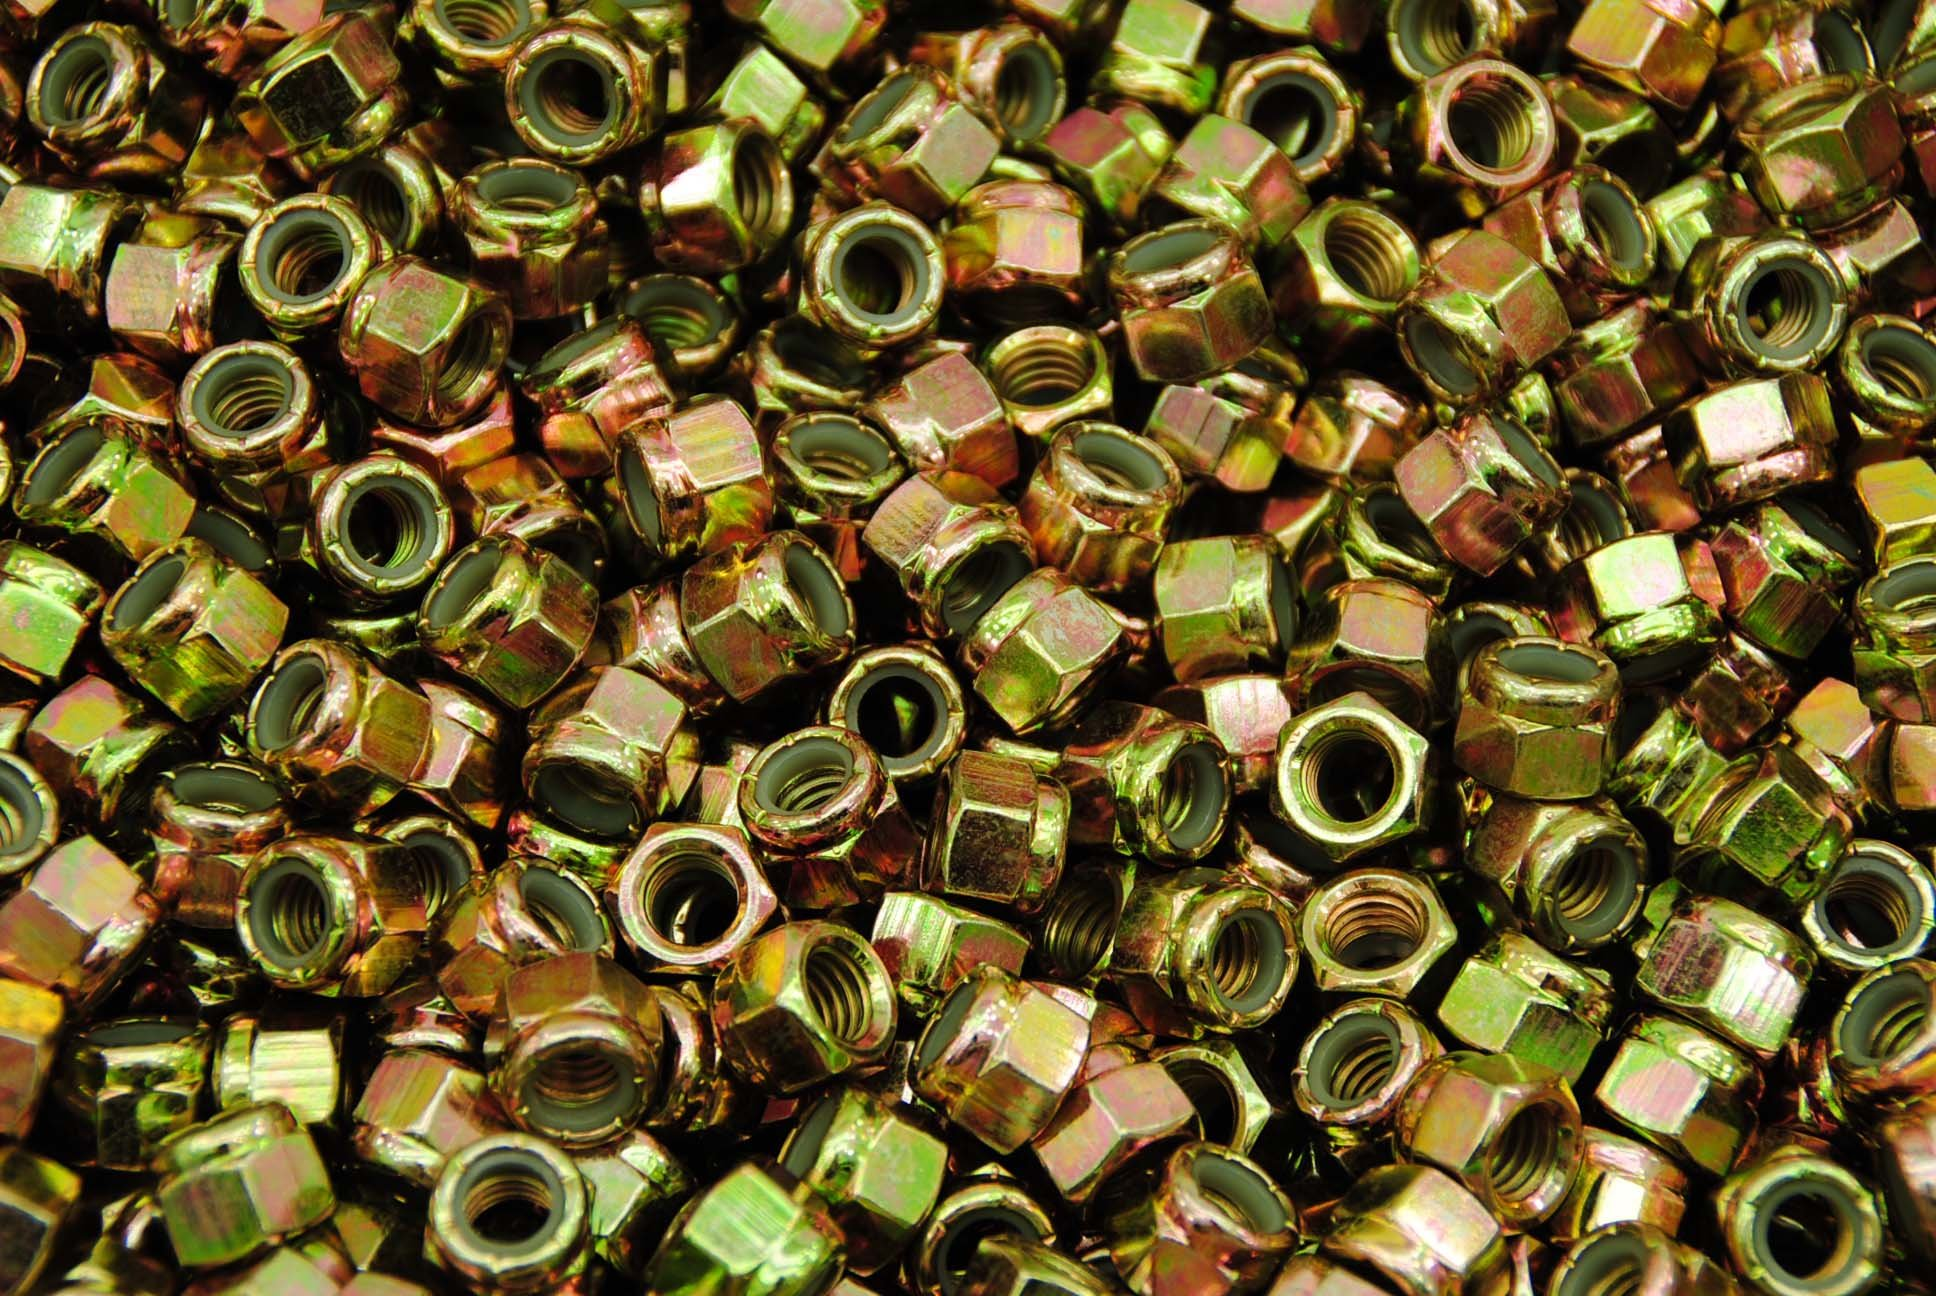 (300) Nyloc Grade 8/C Hex Locking Nuts 3/8-16 Yellow Zinc Plated Nylock